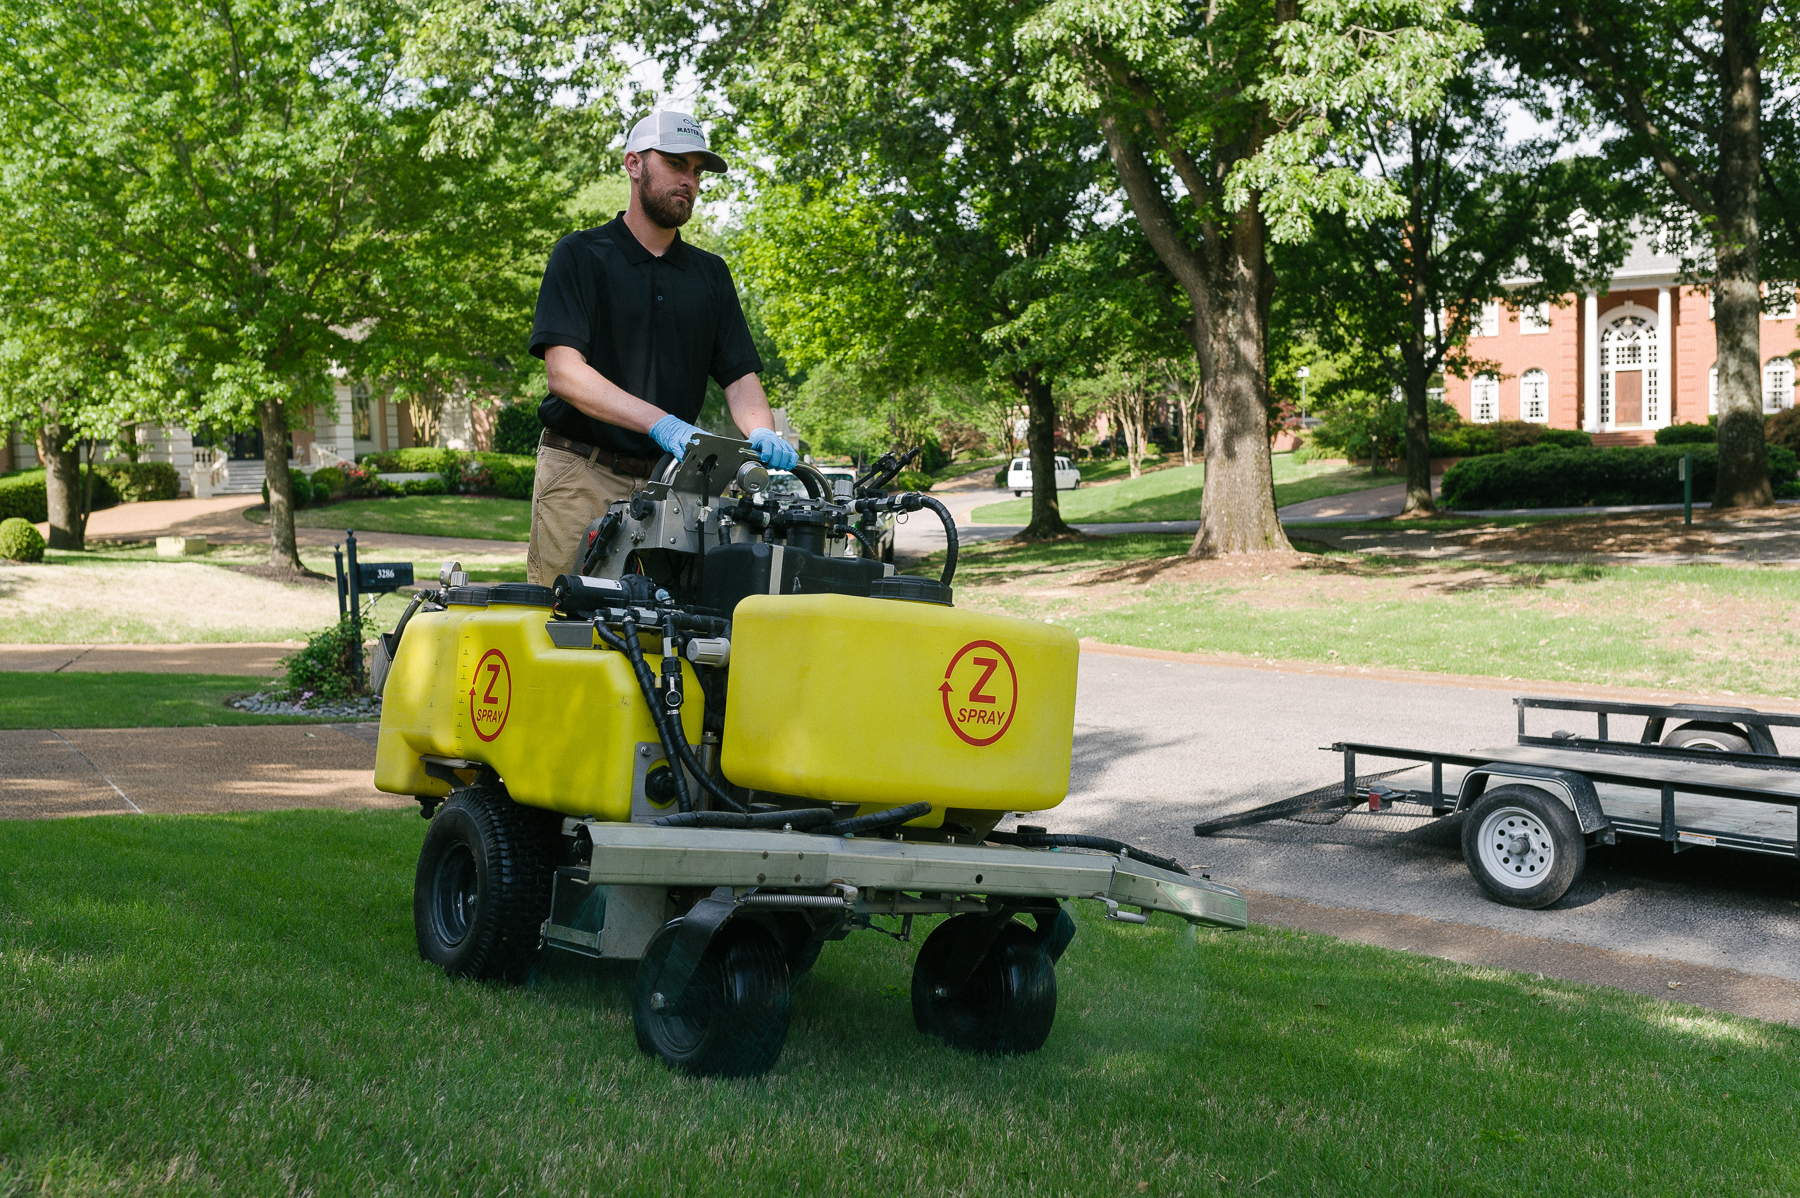 Lawn care technician using a ride-on machine sprayer